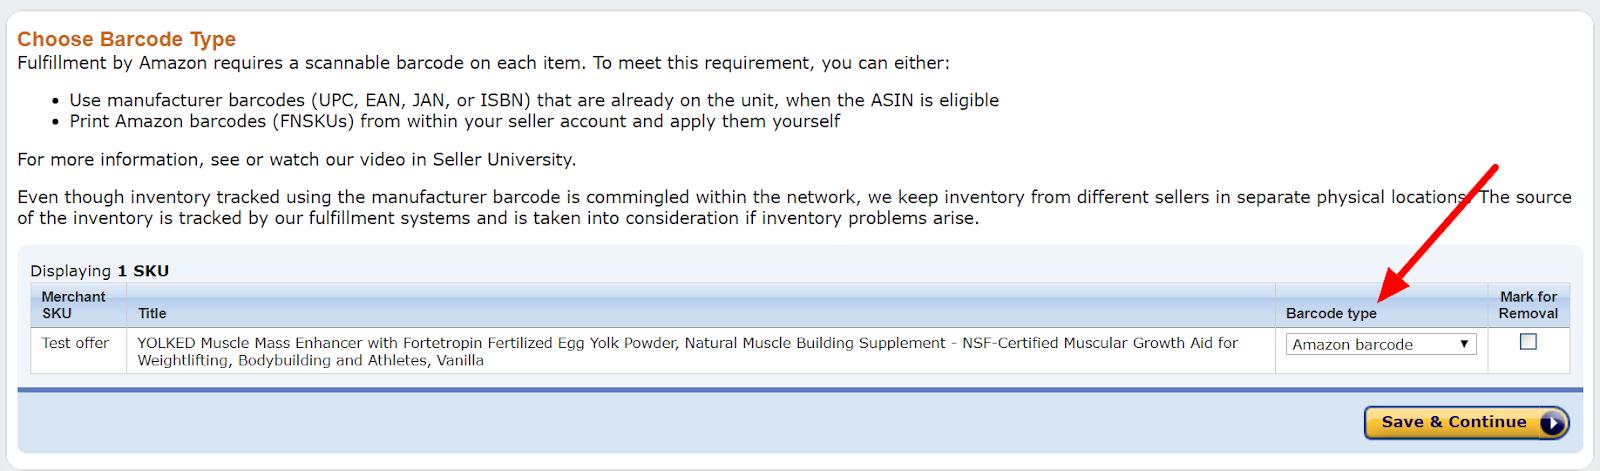 Seller Central - Send Inventory To Amazon - Amazon